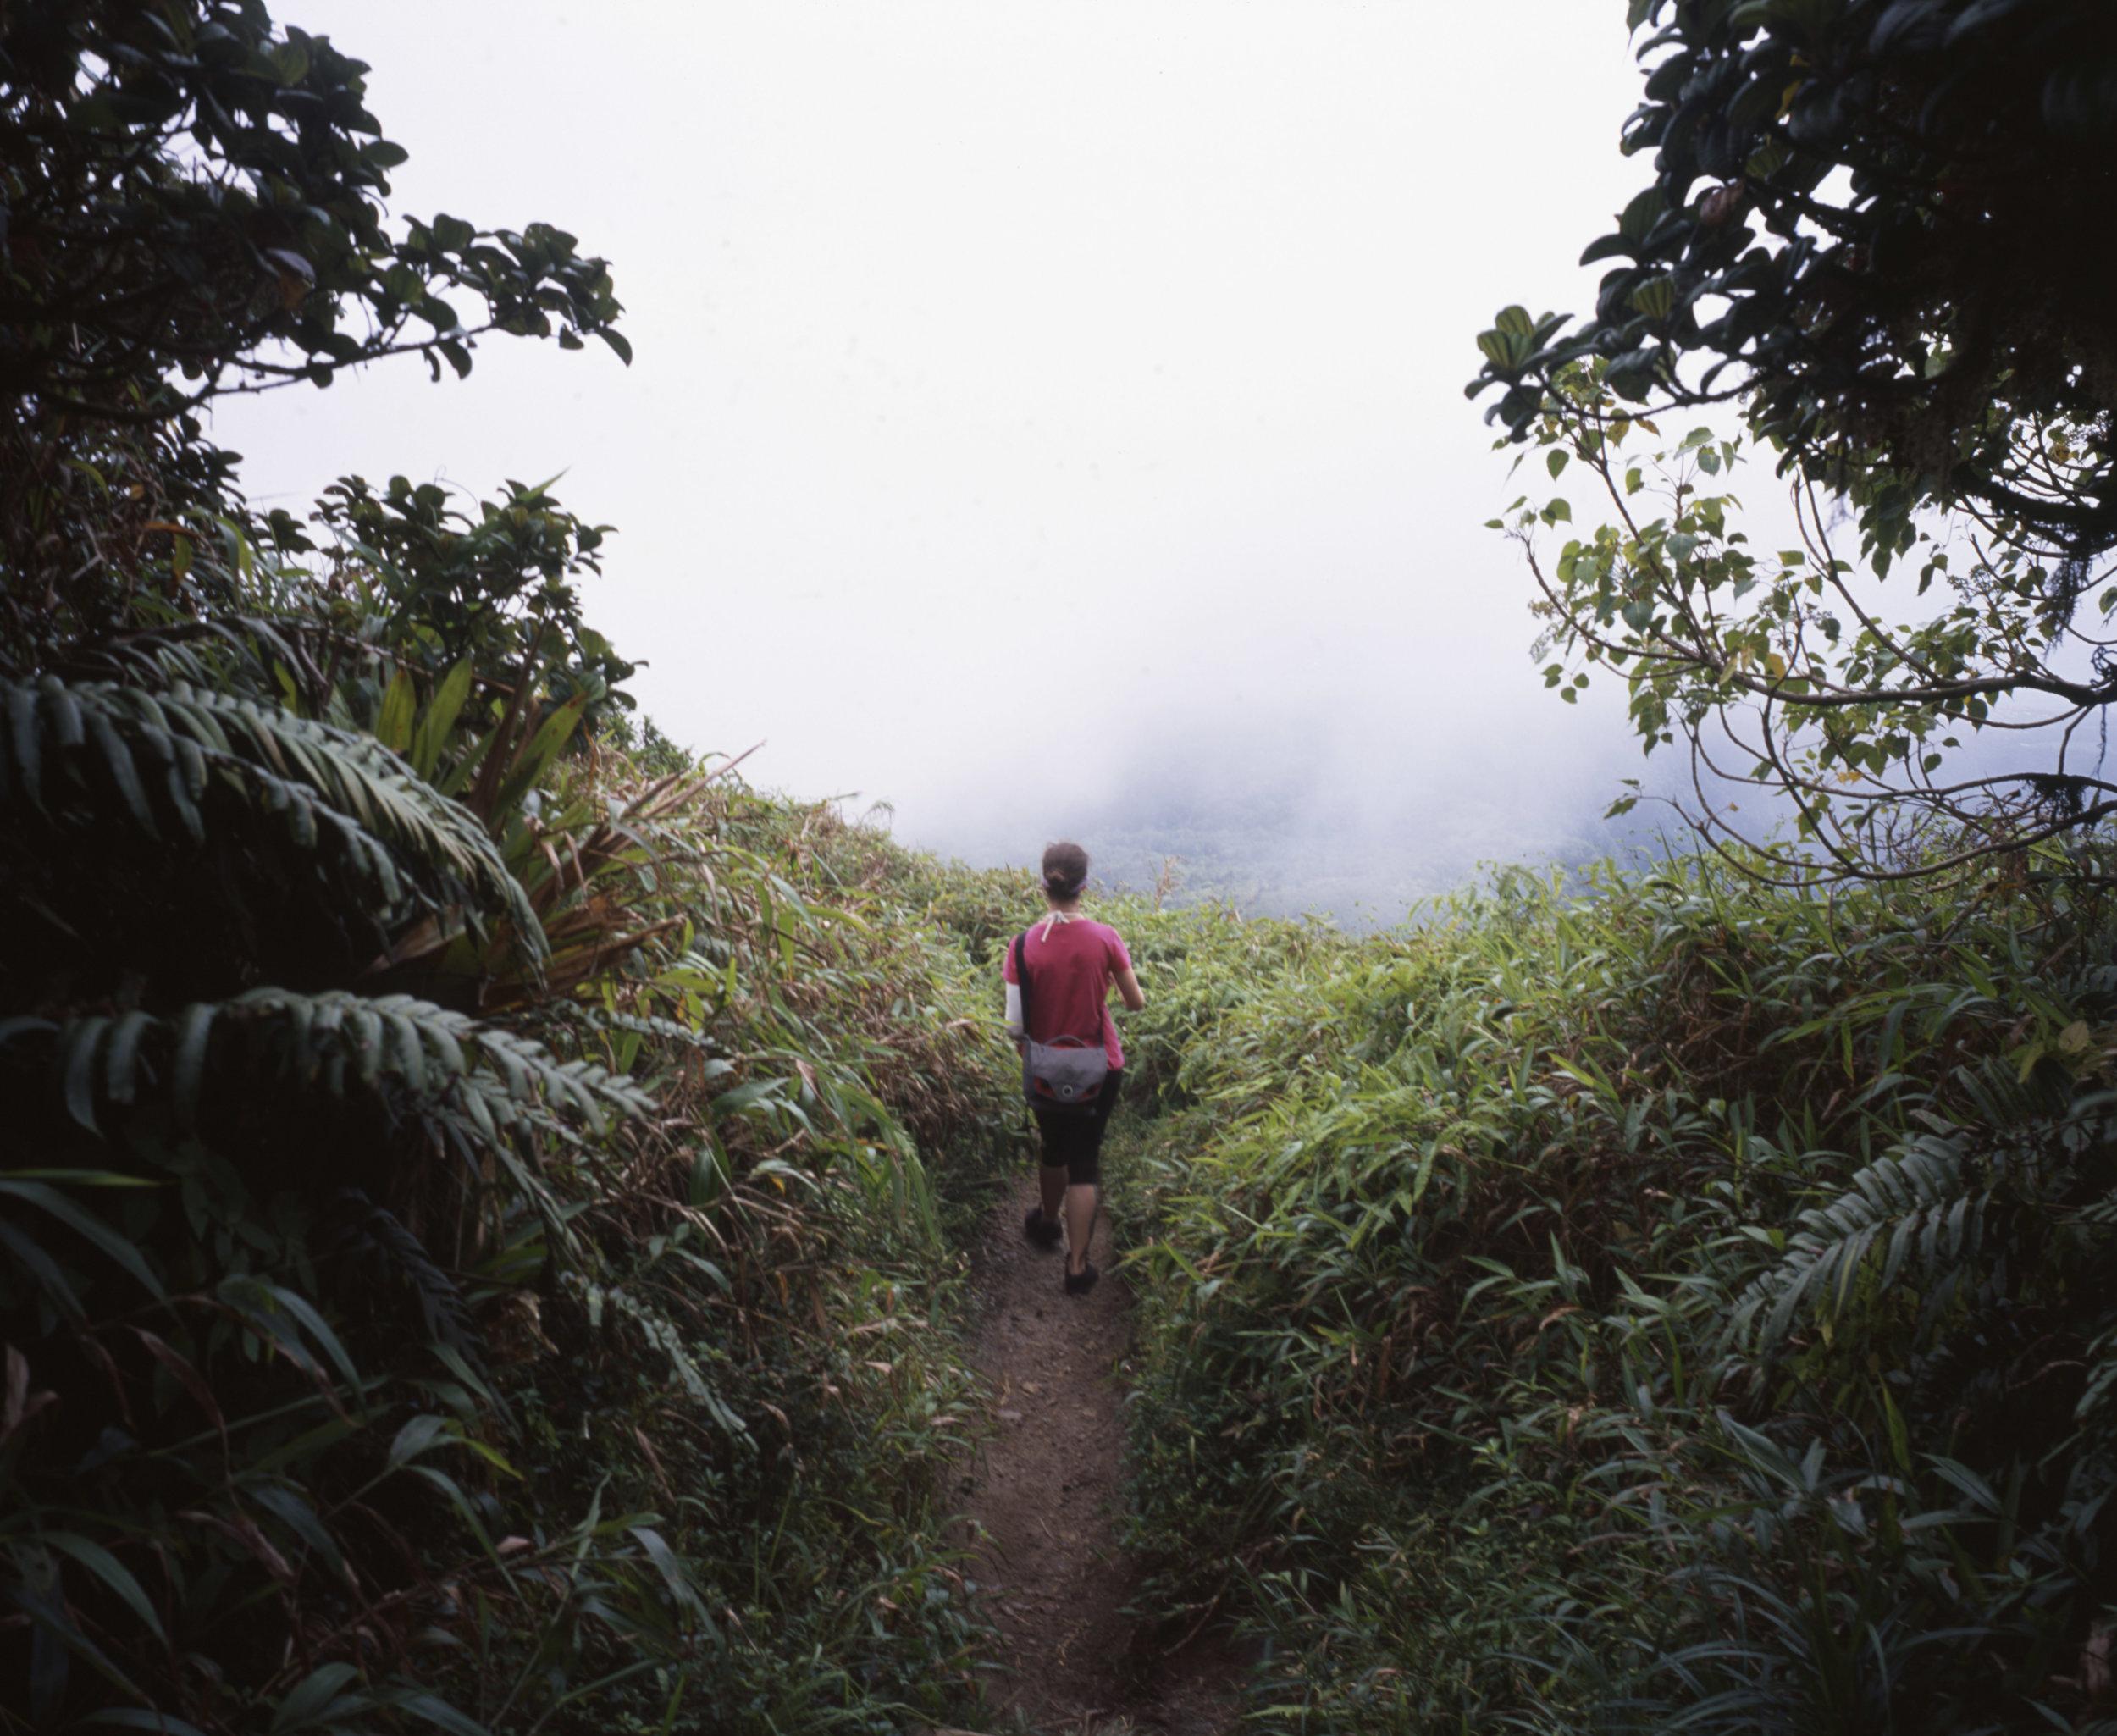 I'd follow this woman anywhere, even  Mount Pelée  Fuji GF670w | Fuji Provia 100f